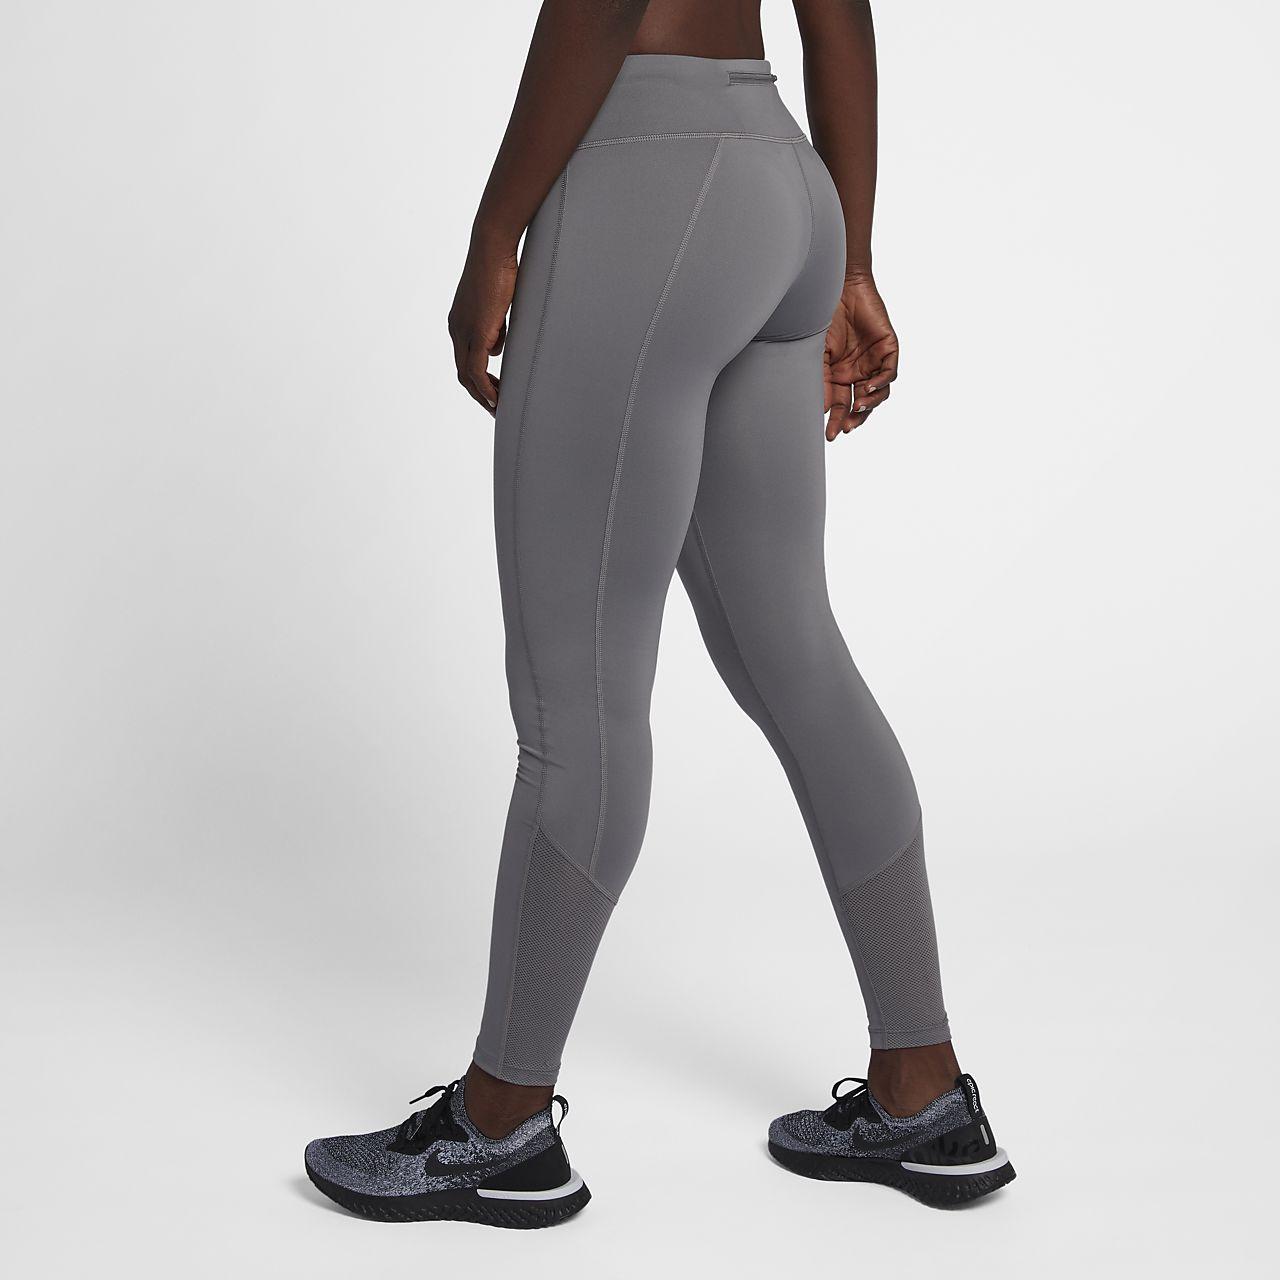 Nike Racer 女款跑步緊身褲